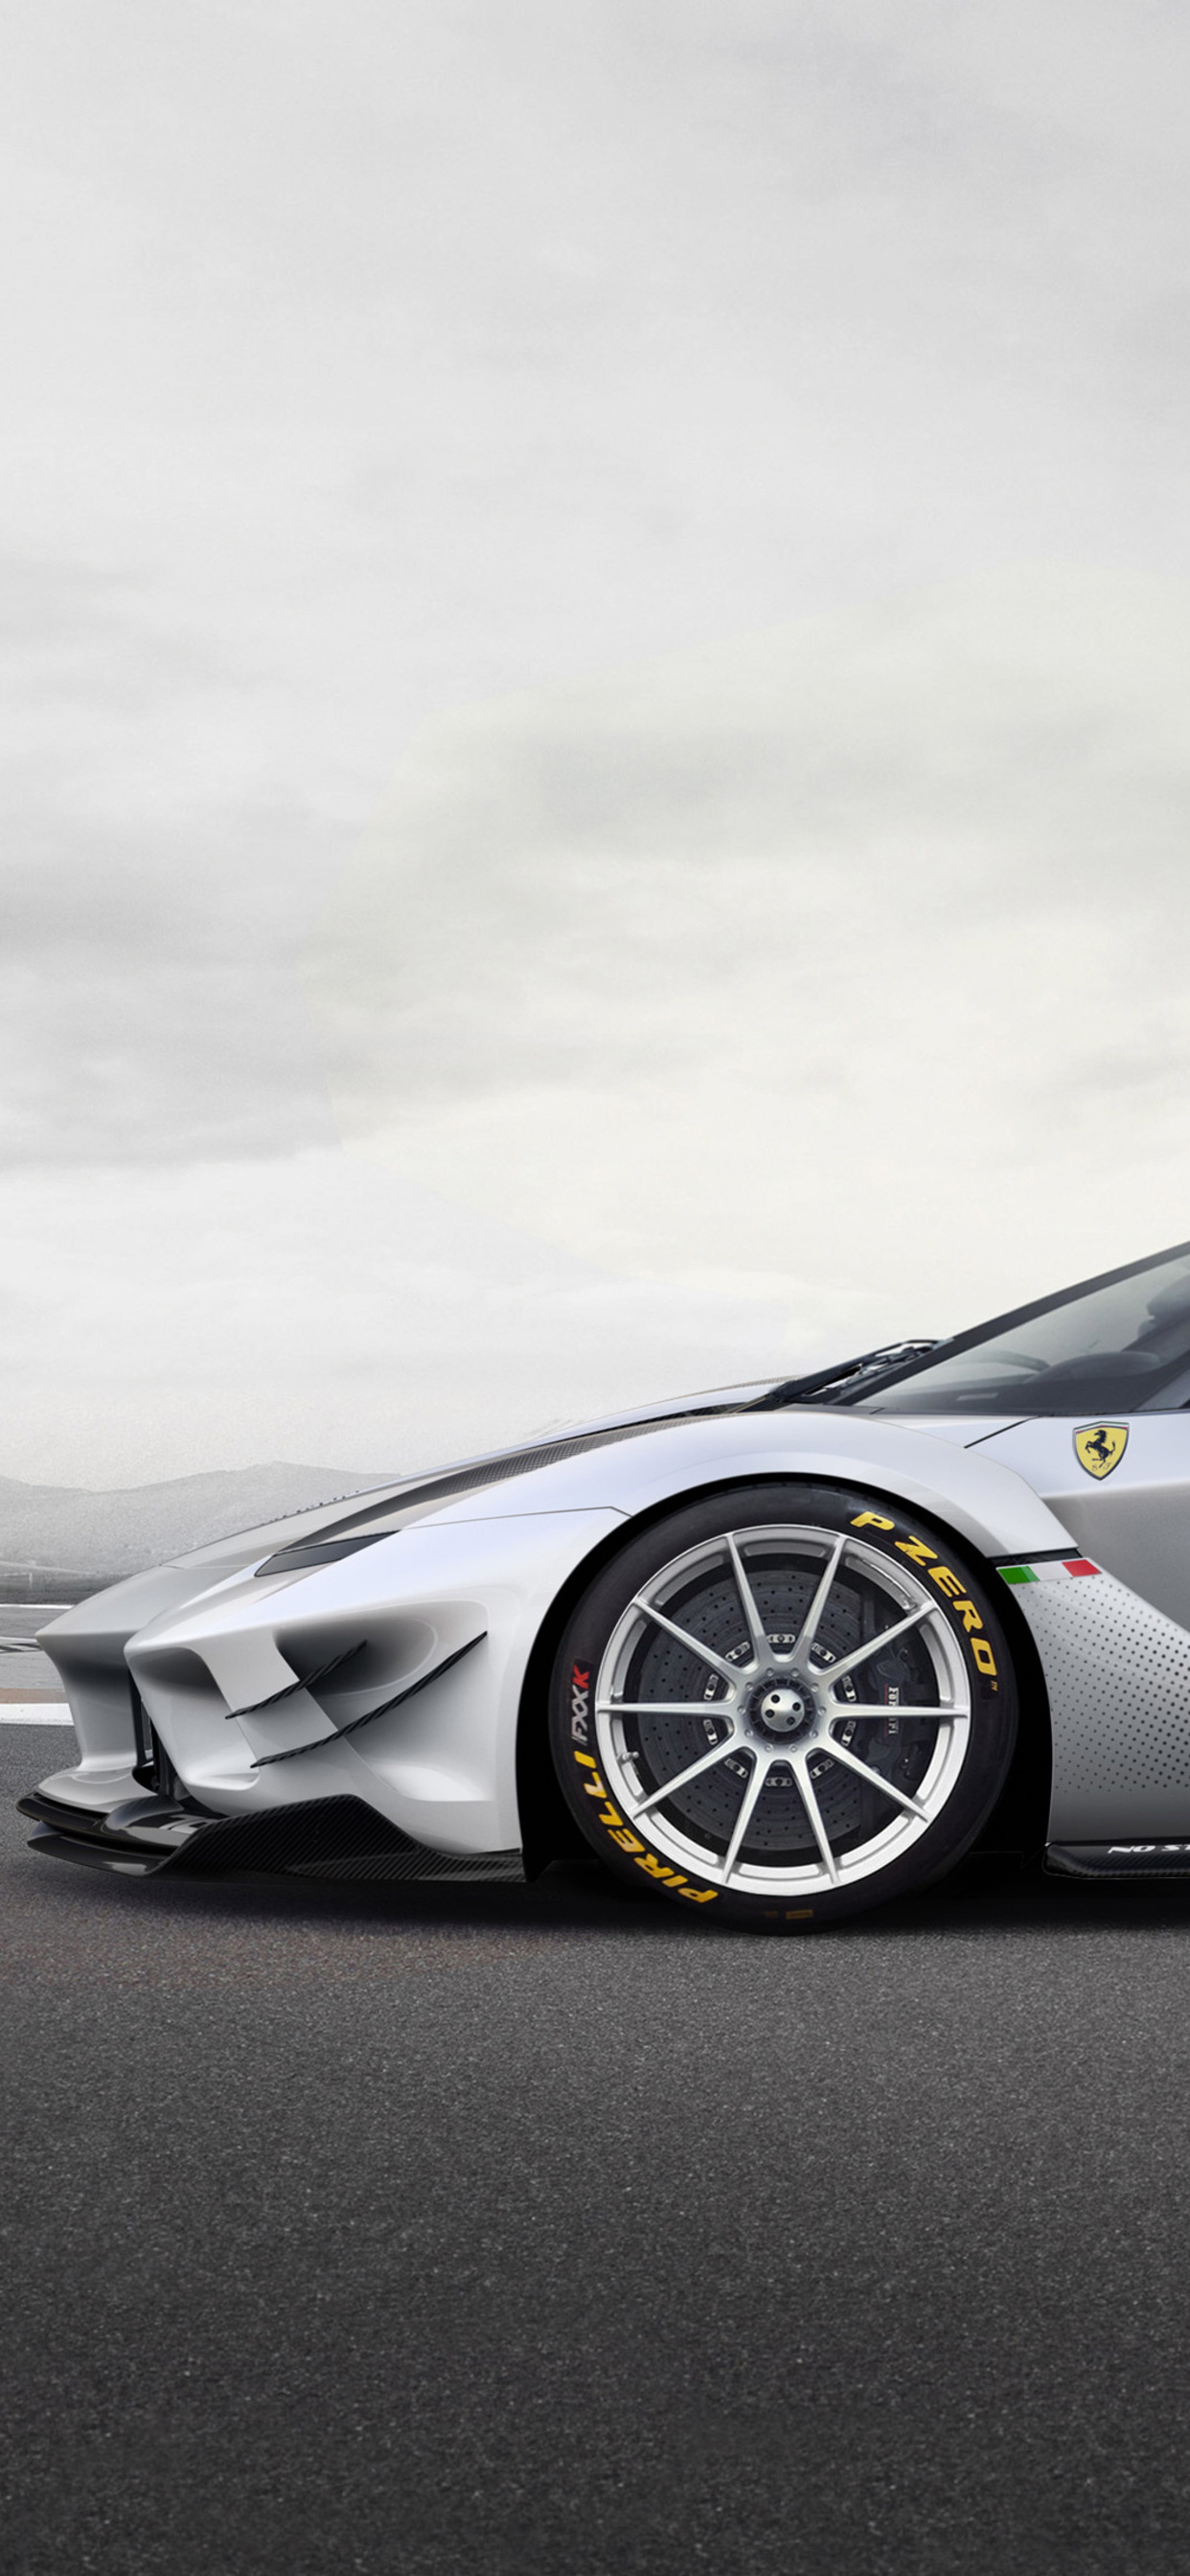 Ferrari Fxx K Evo  K Iphone Xs Max